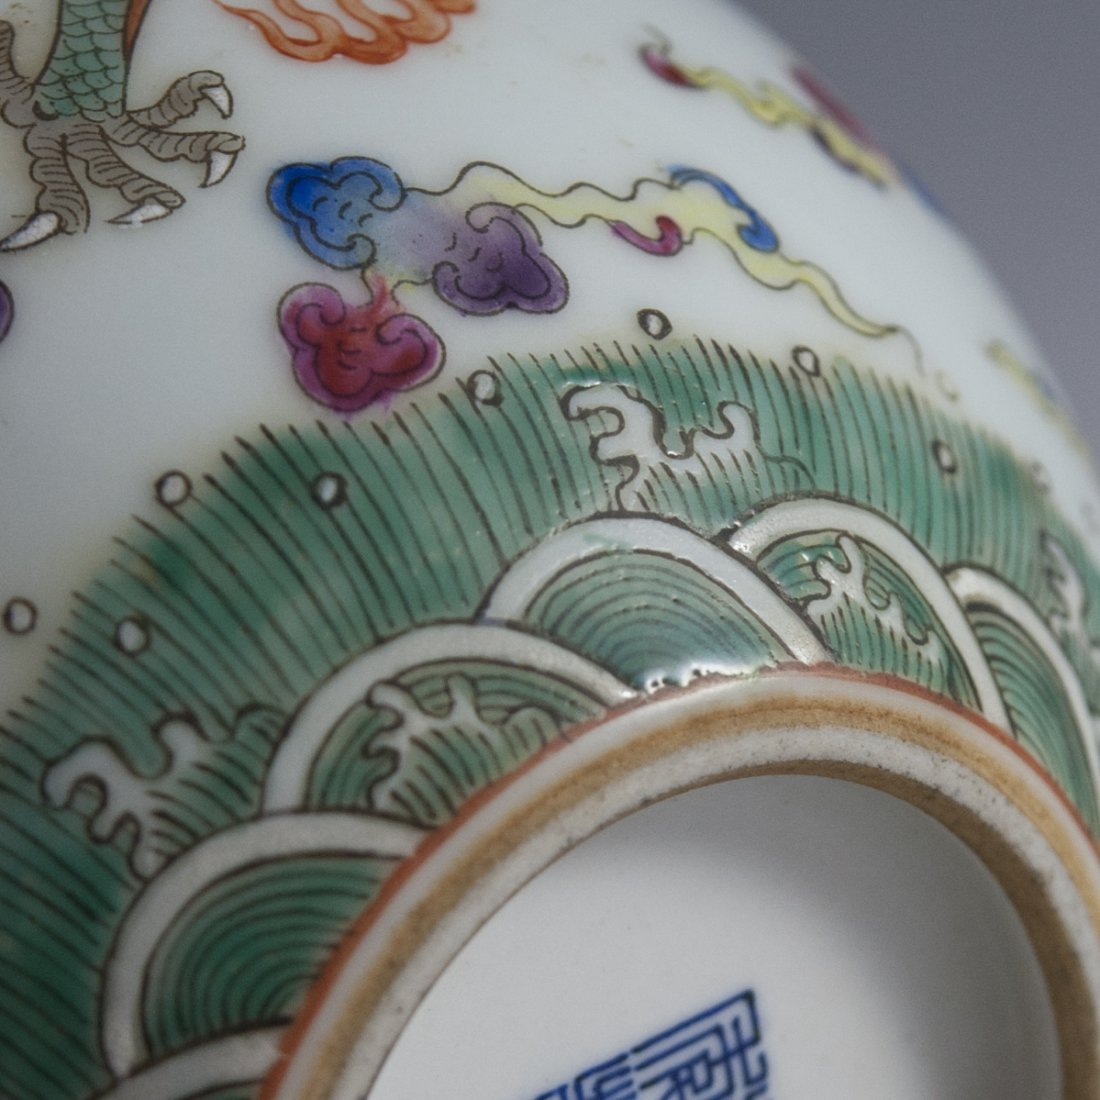 Chinese Famille Jaune Double Gourd Vase - 7